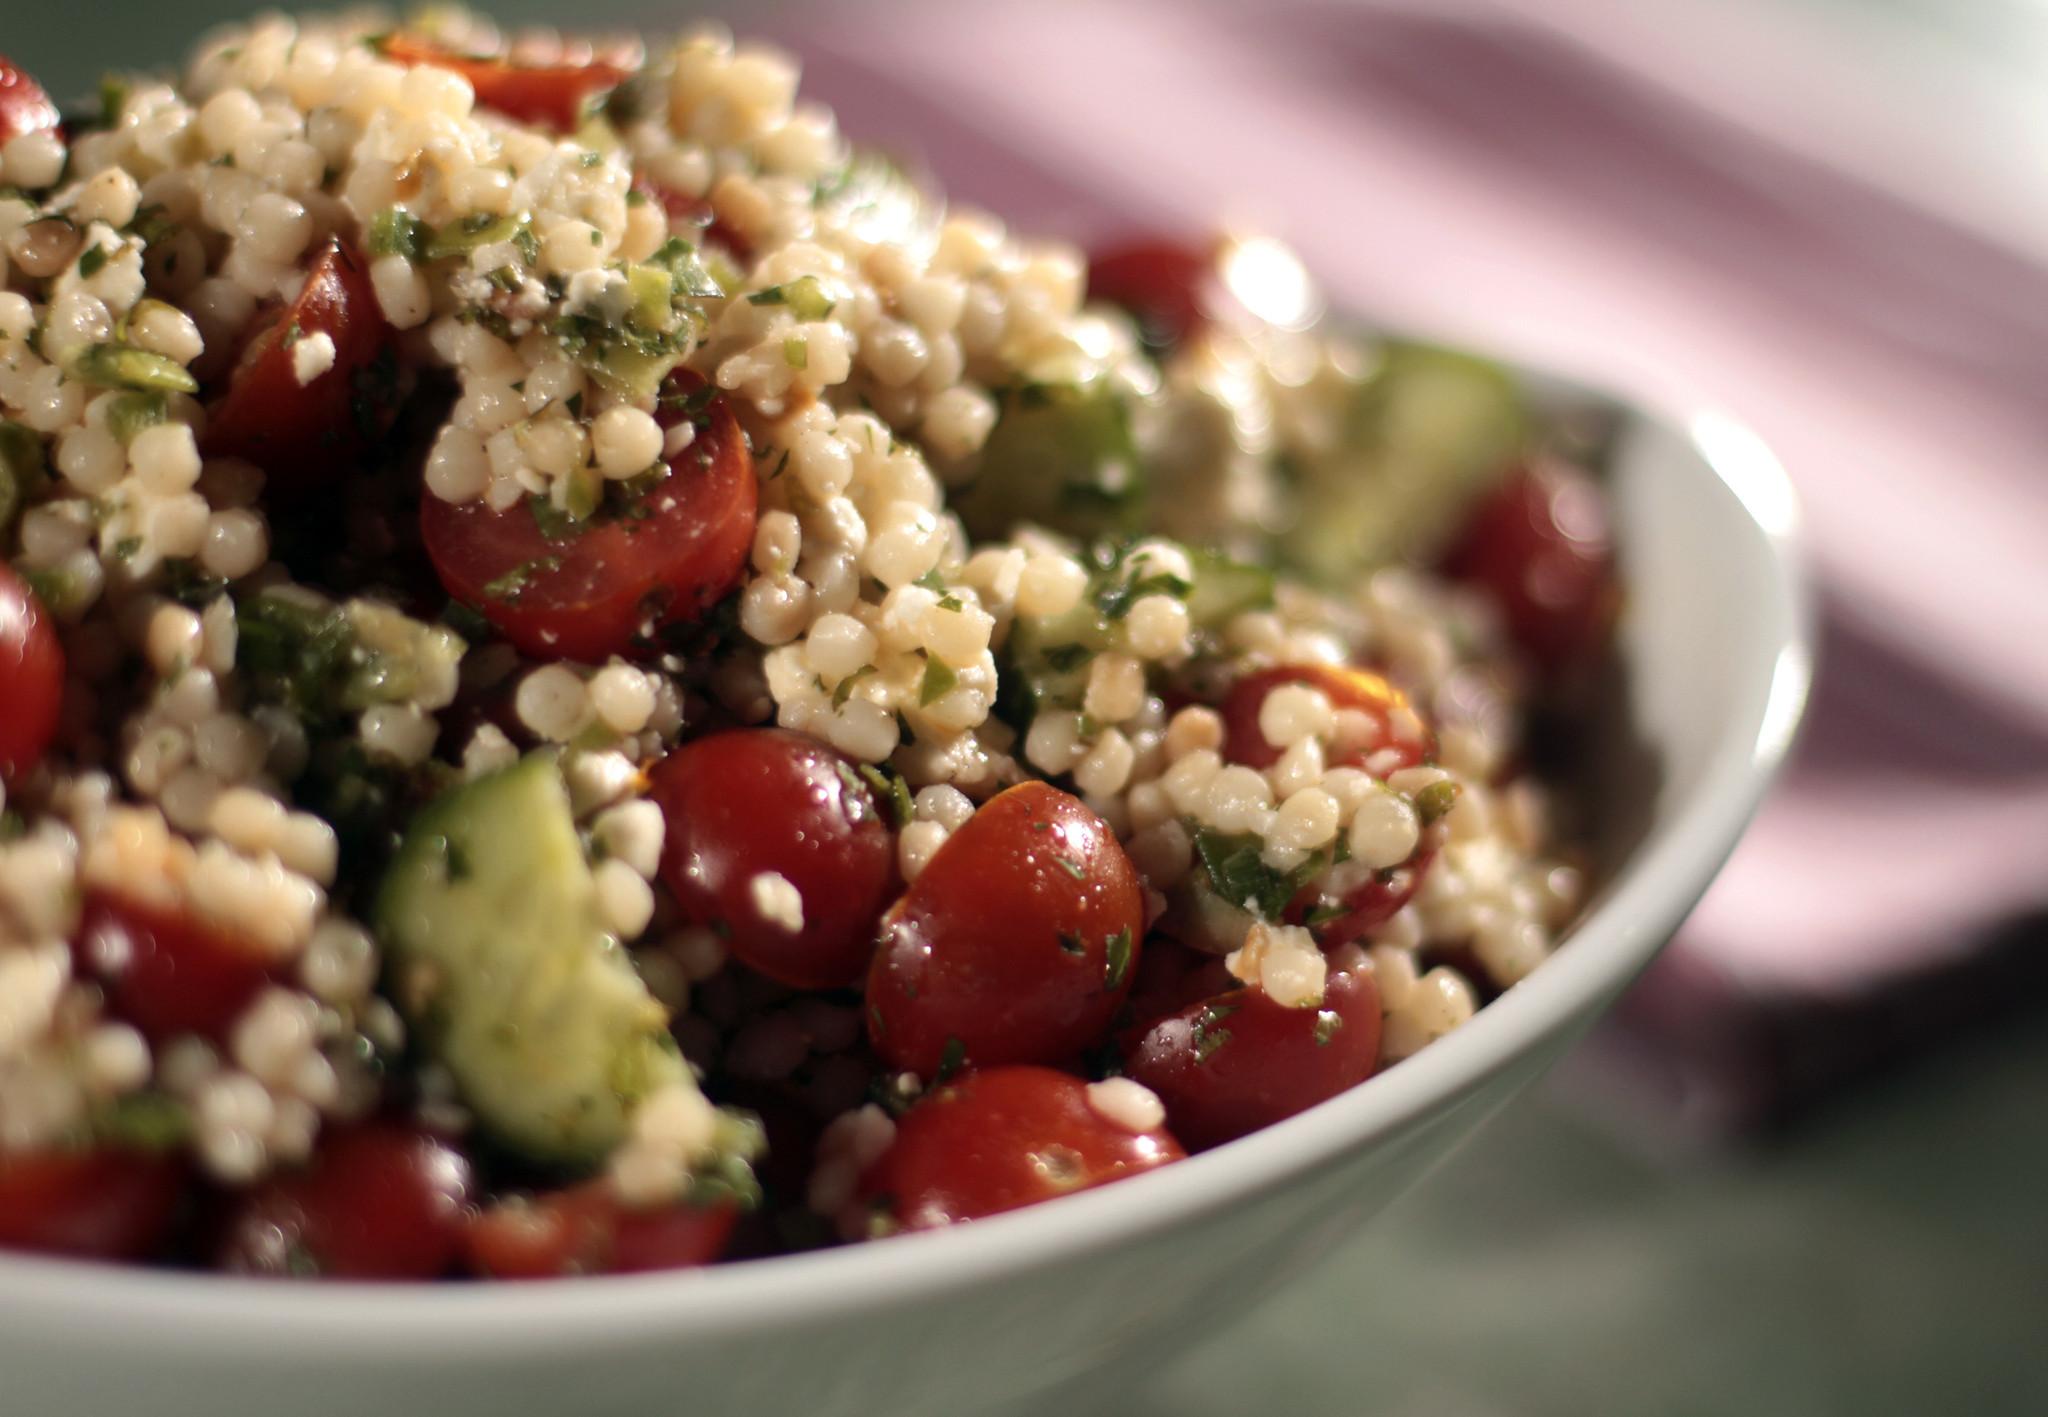 Grain salad convert sings the praises of quinoa, farro and ...